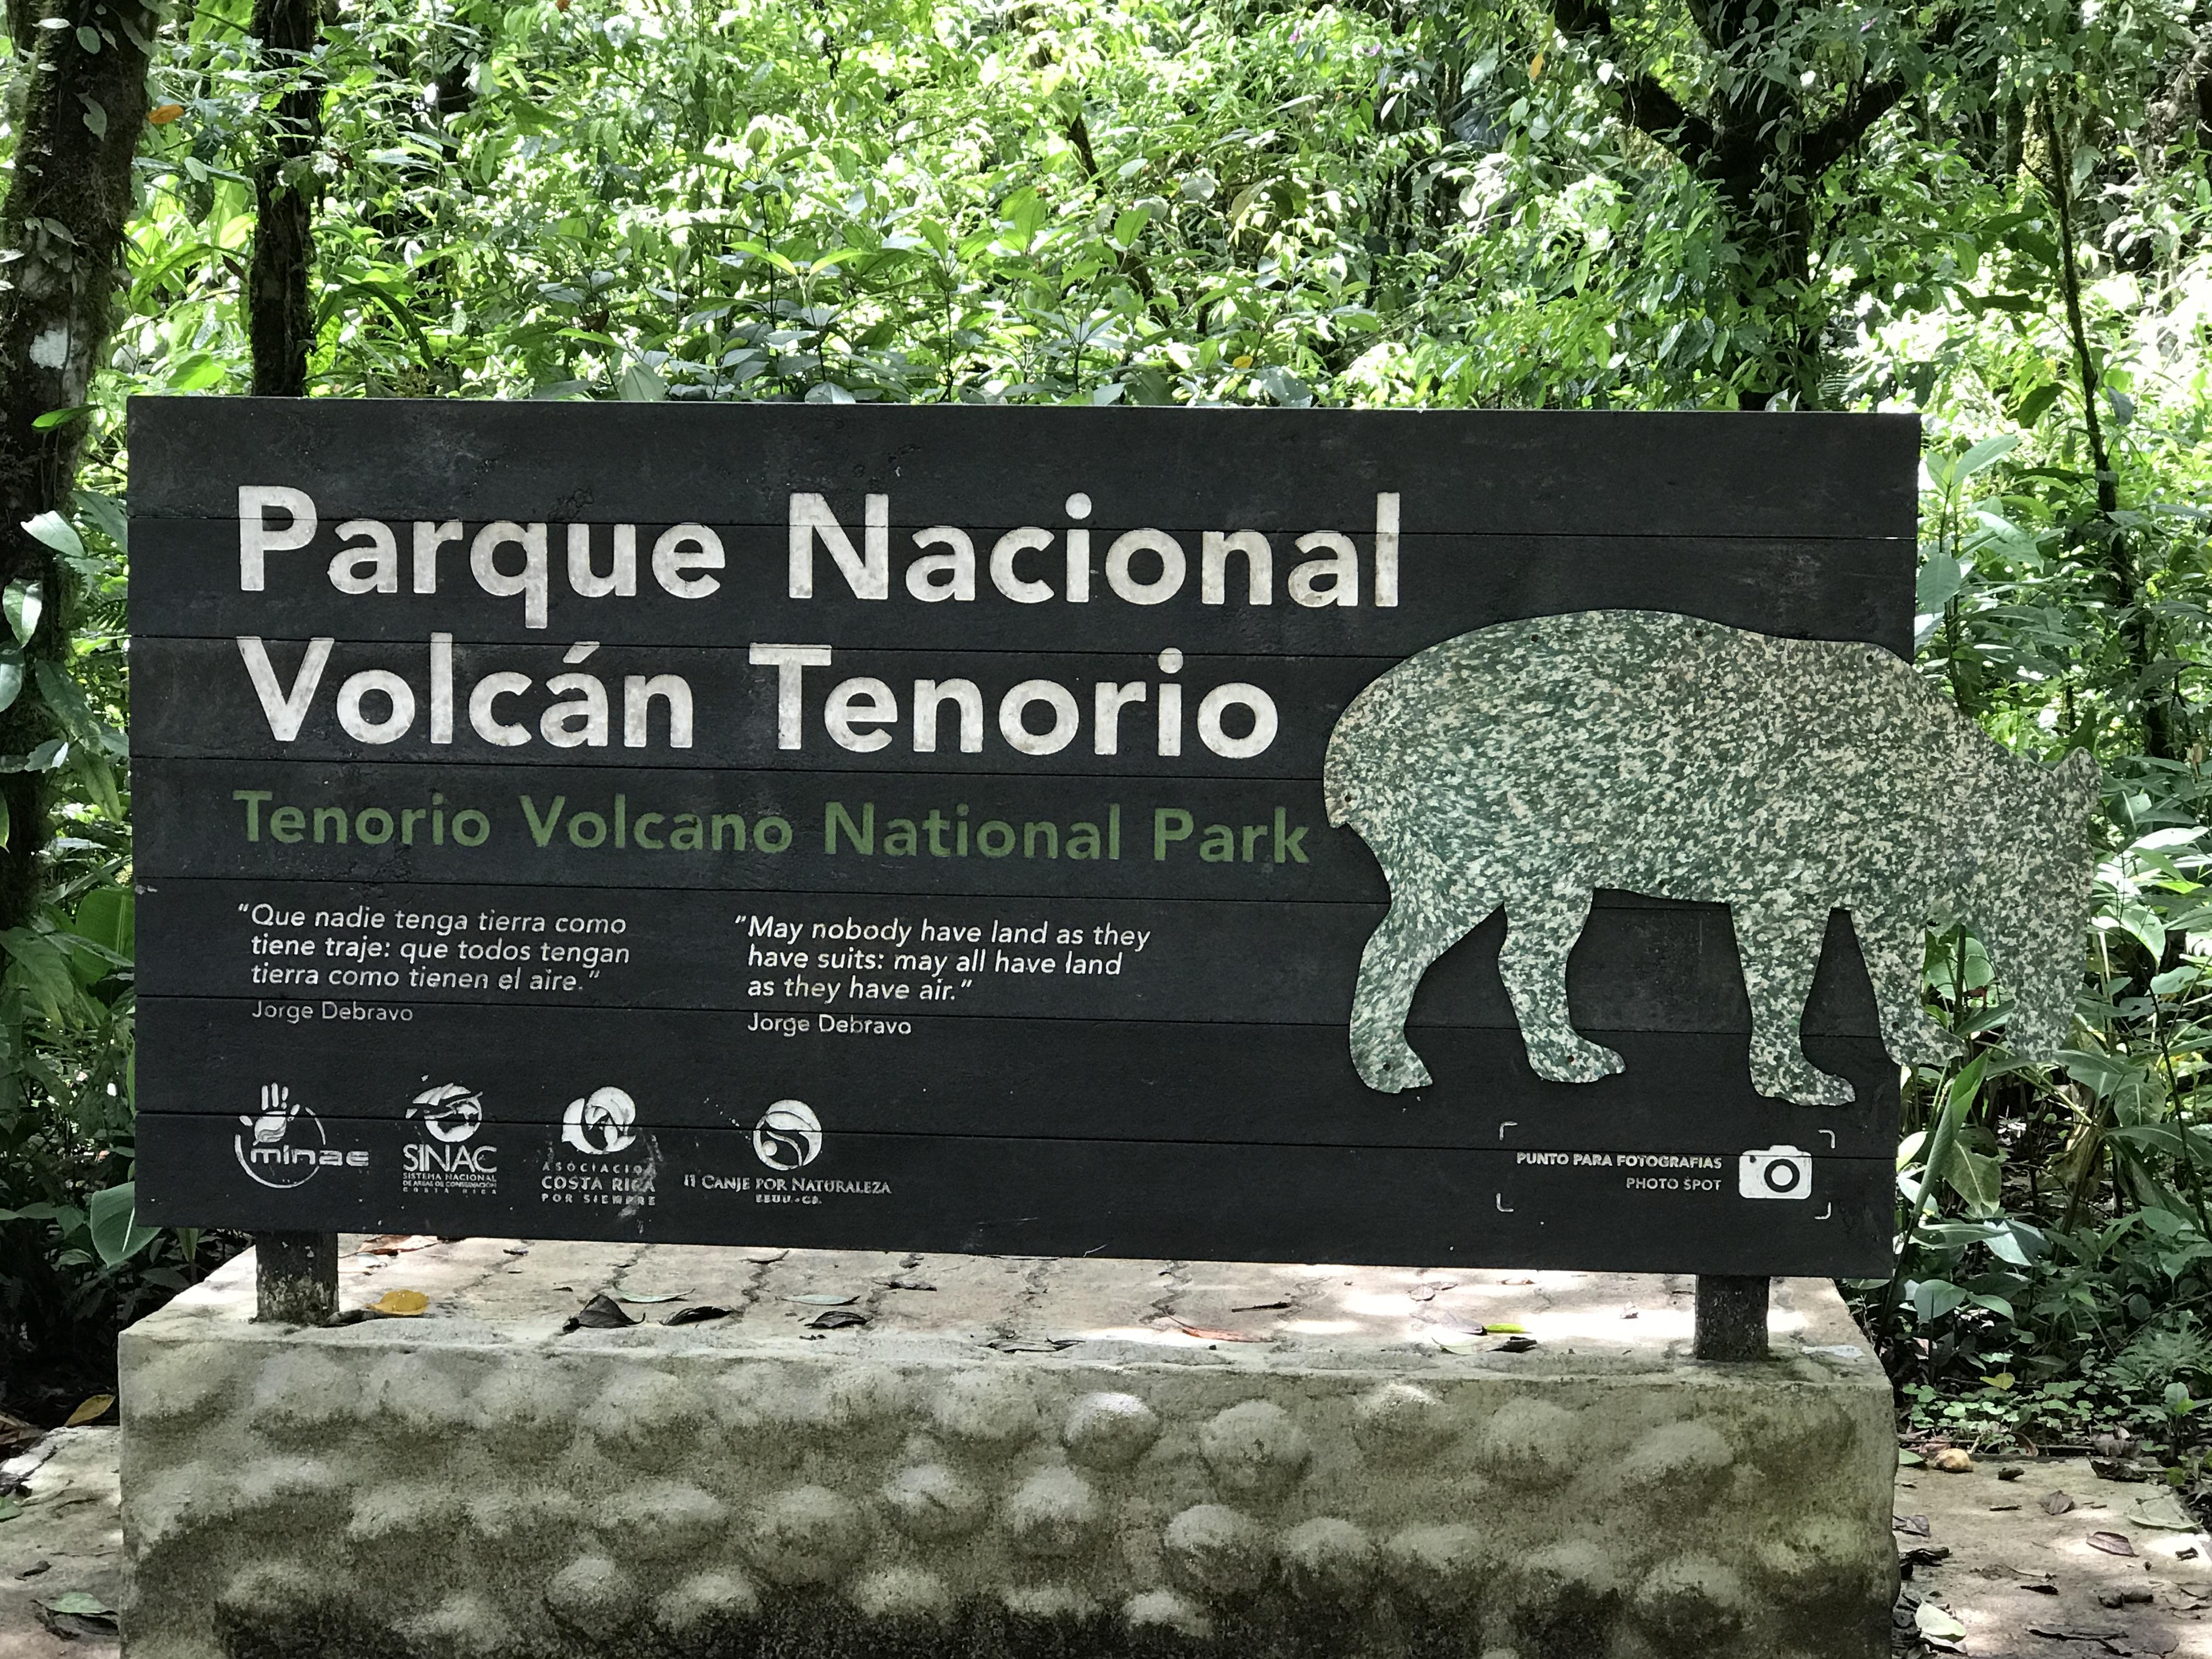 Visiting Rio Celeste in Costa Rica using Waze | Costa Rica